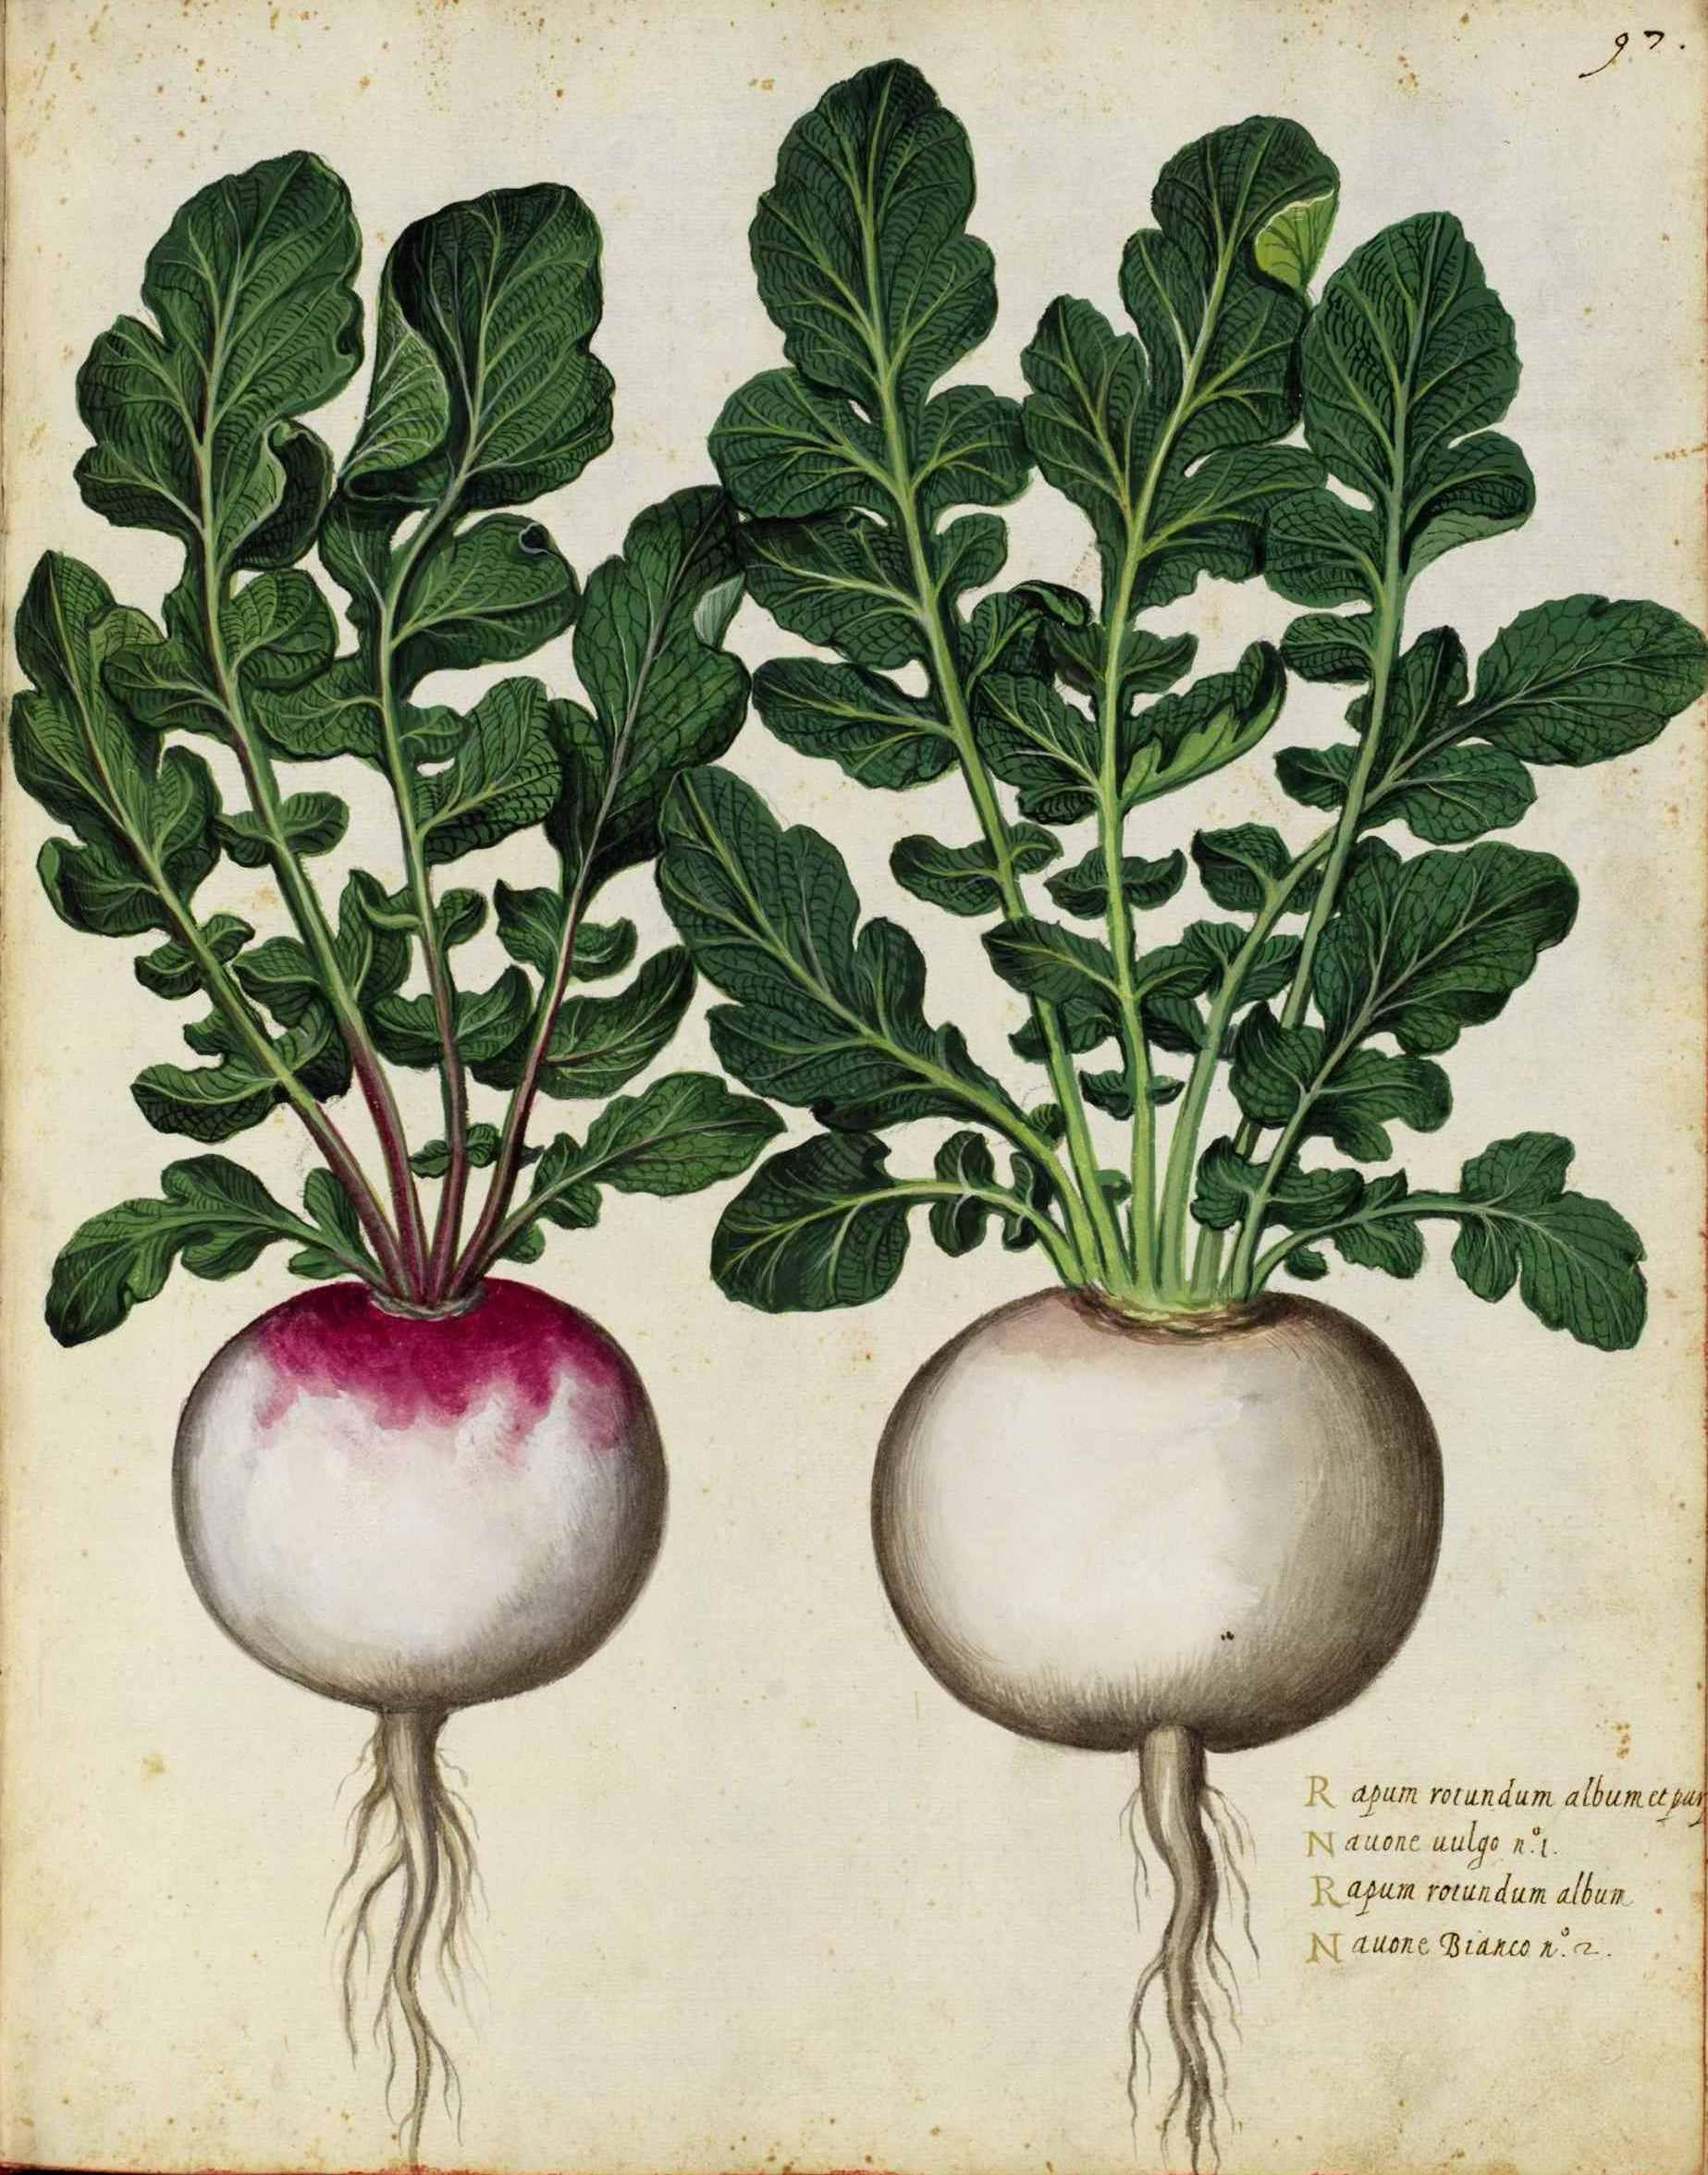 Drawn vegetable botanical illustration Fazendo Botanical deparo textos Nas